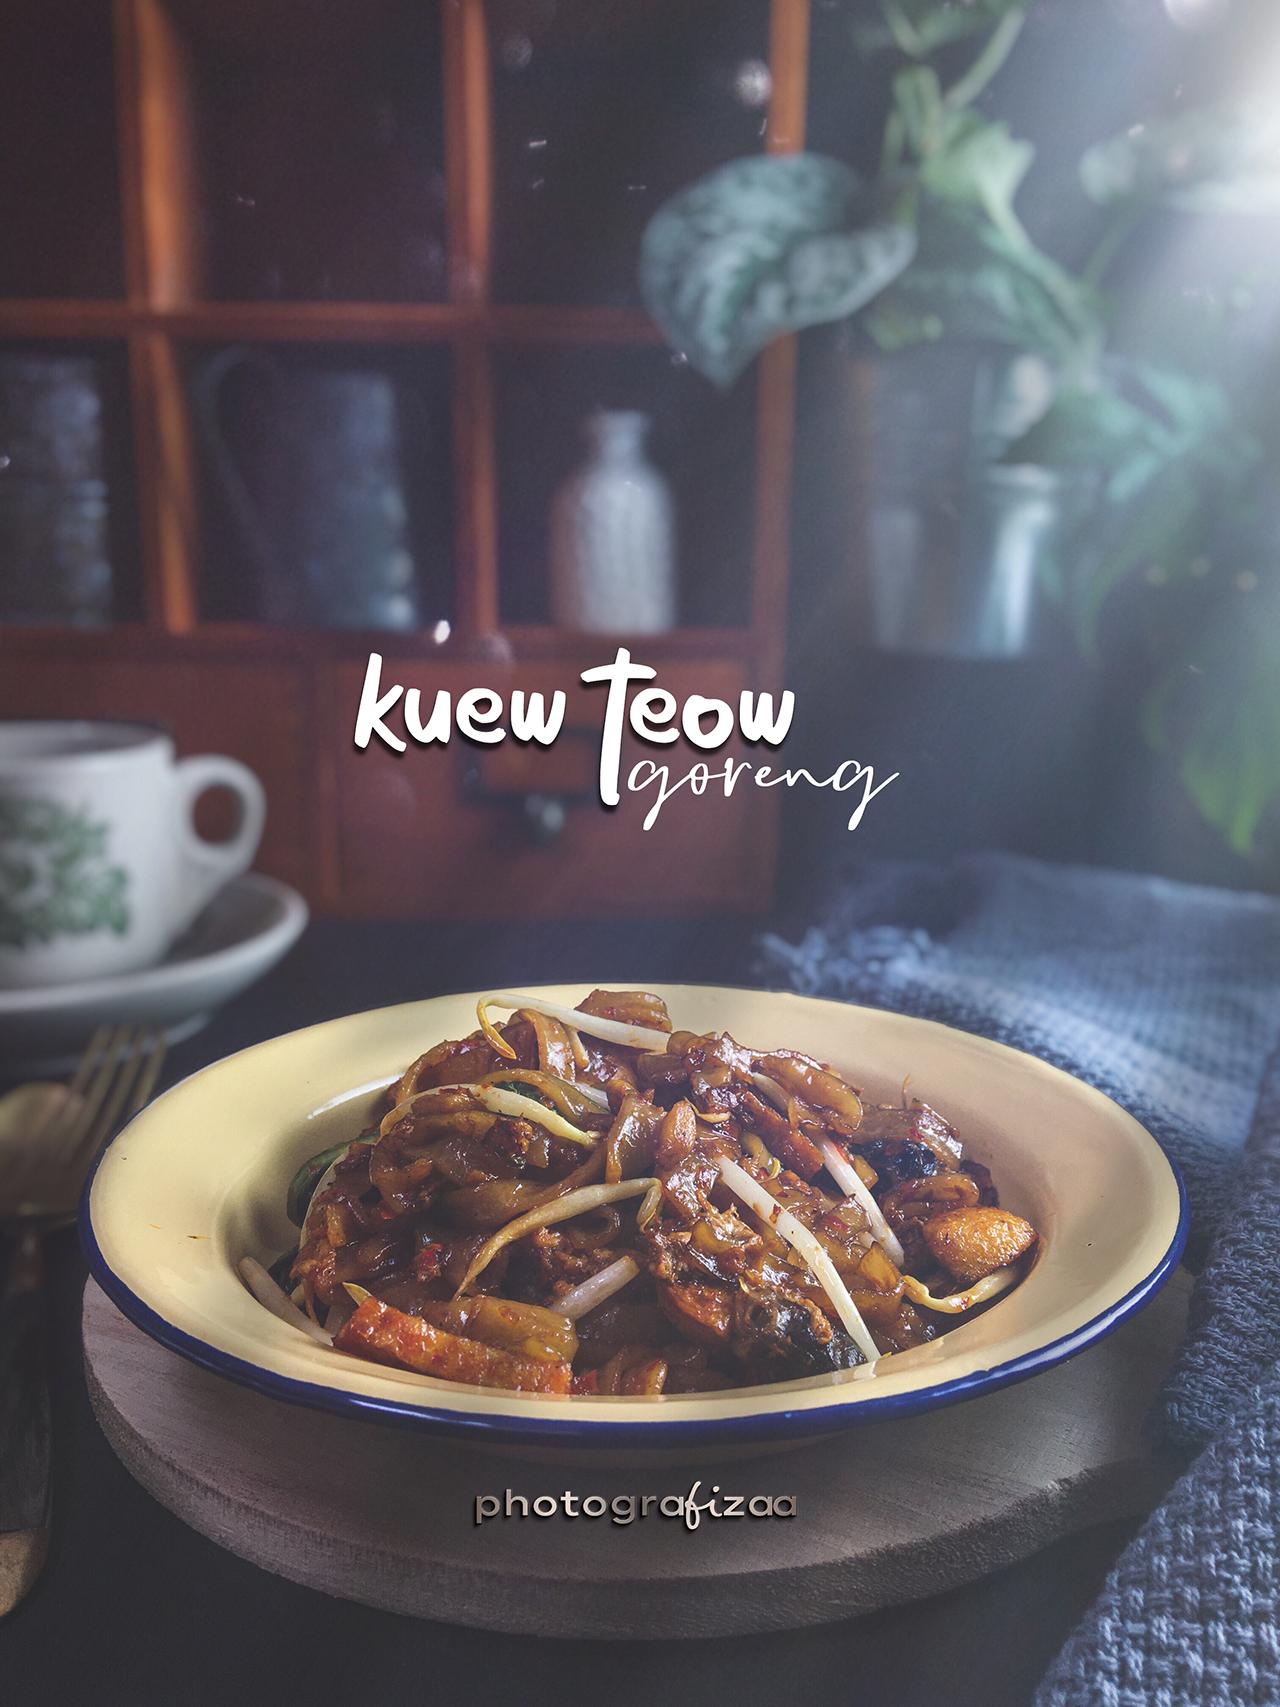 Resepi Kuew Teow Goreng